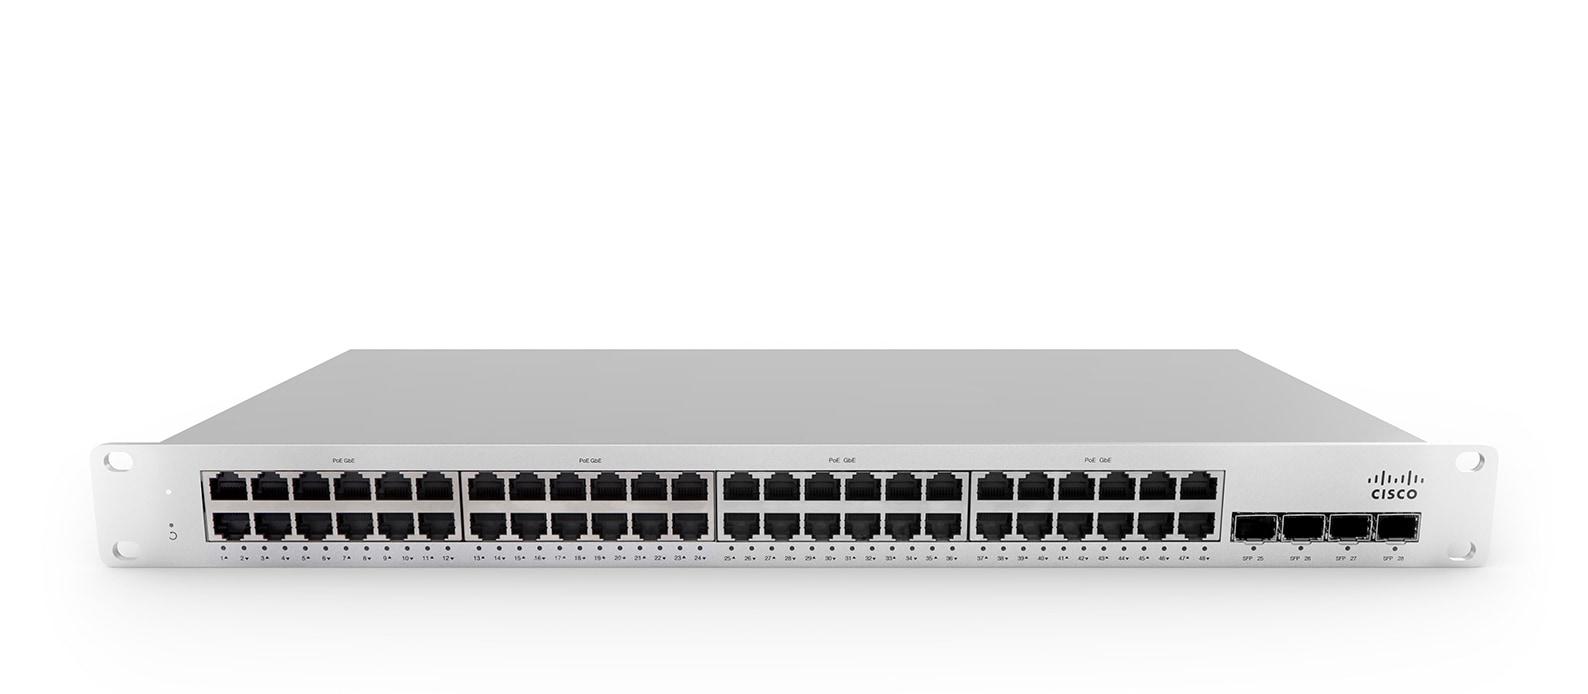 Cisco Meraki MS210-48 Cloud Managed Products